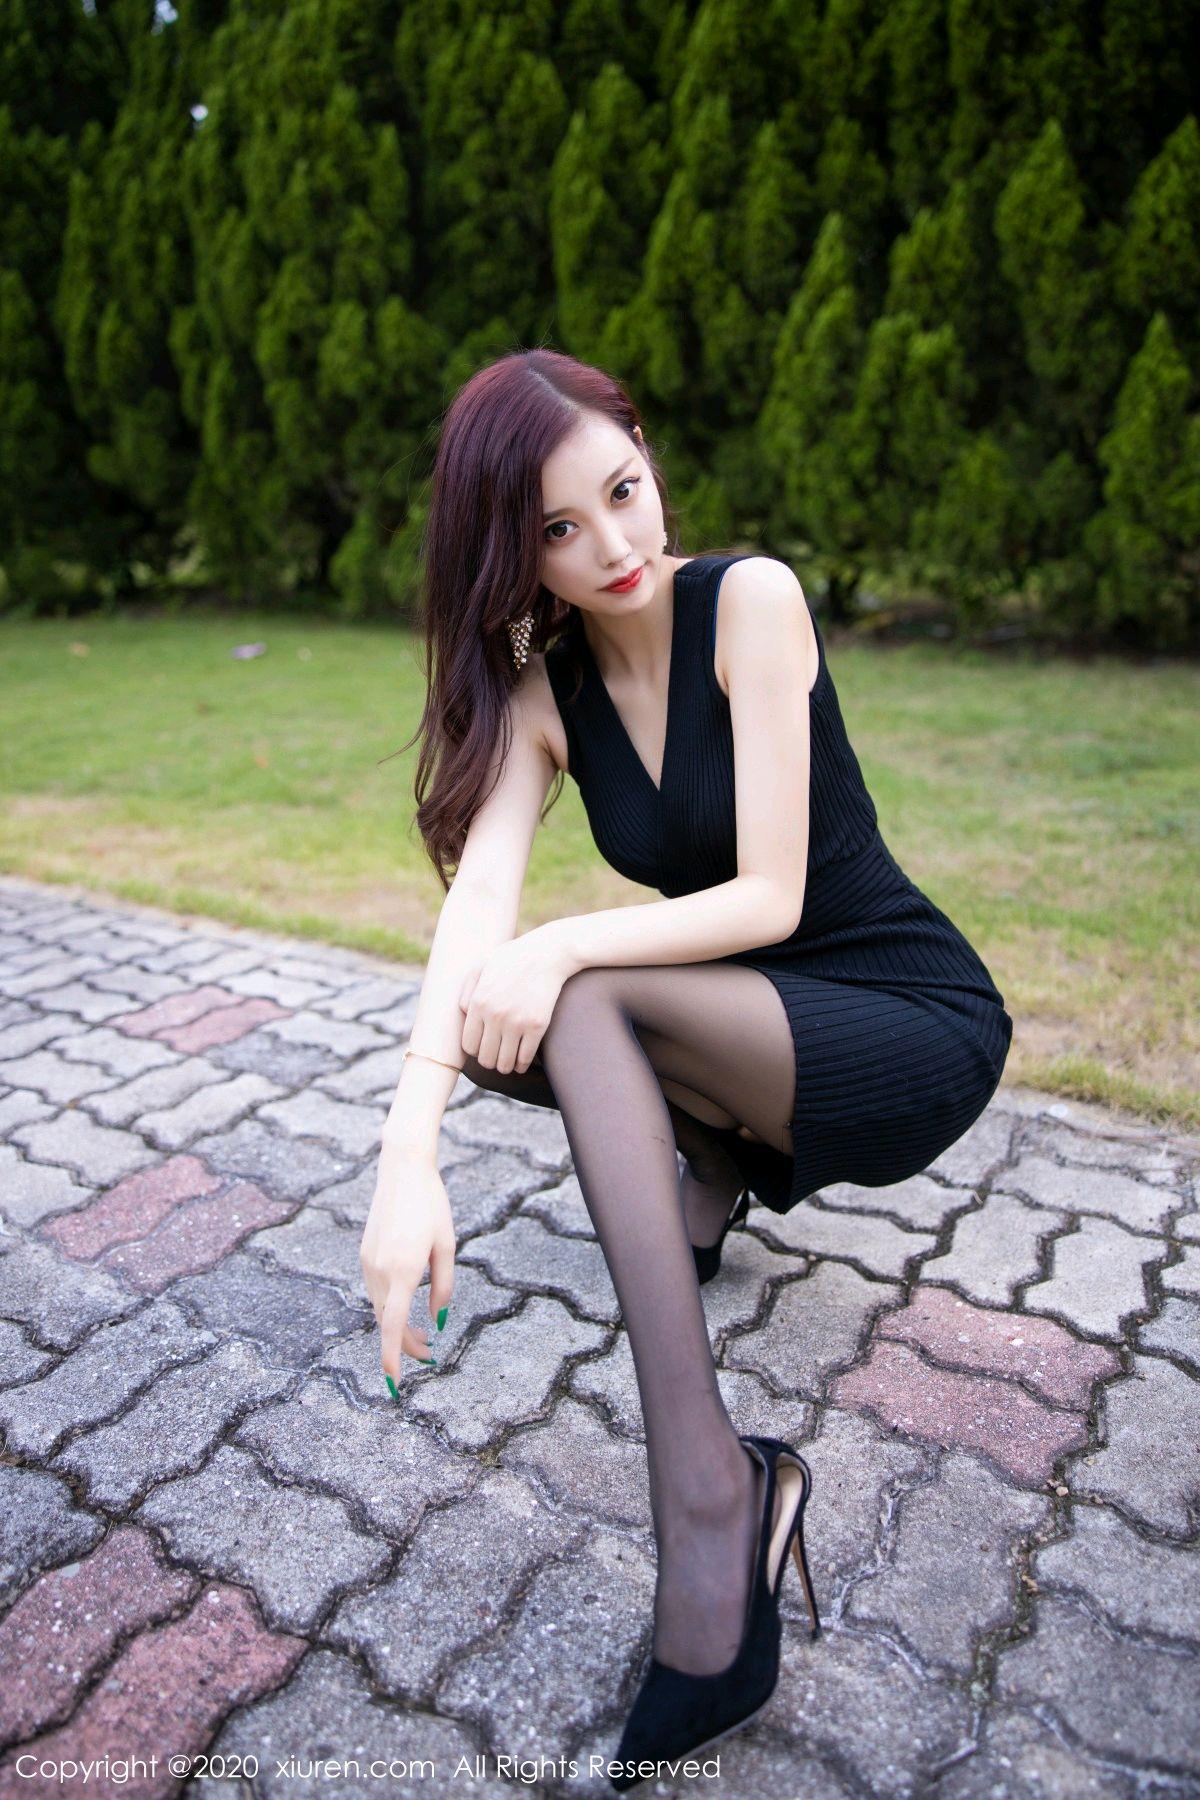 [XiuRen] Vol.2648 Yang Chen Chen 9P, Black Silk, Outdoor, Xiuren, Yang Chen Chen